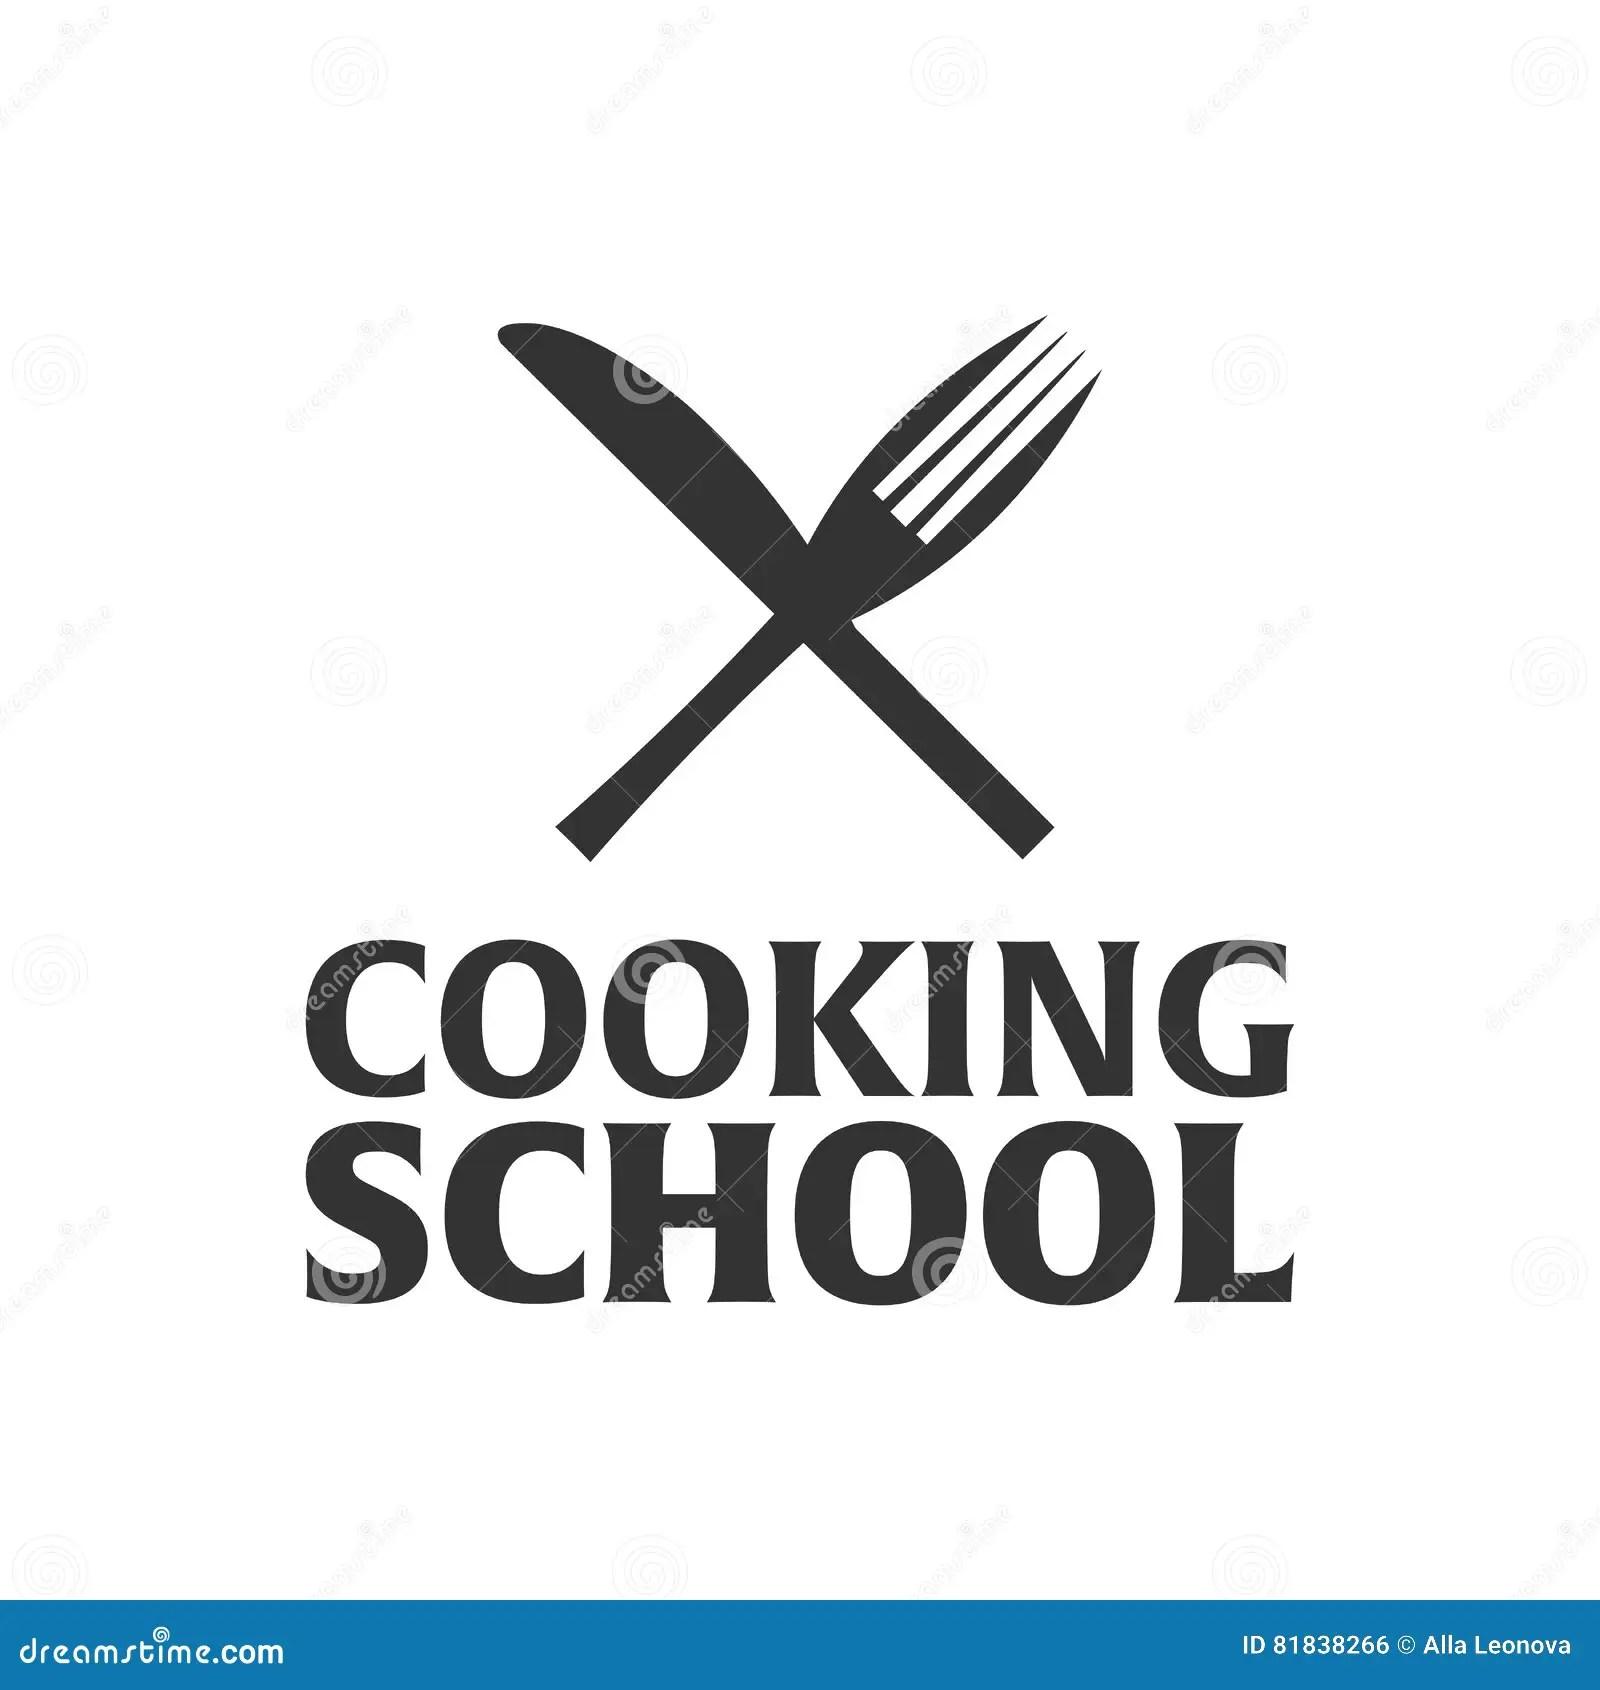 Cooking School Logo. Cooking Academy. Vector Illustration